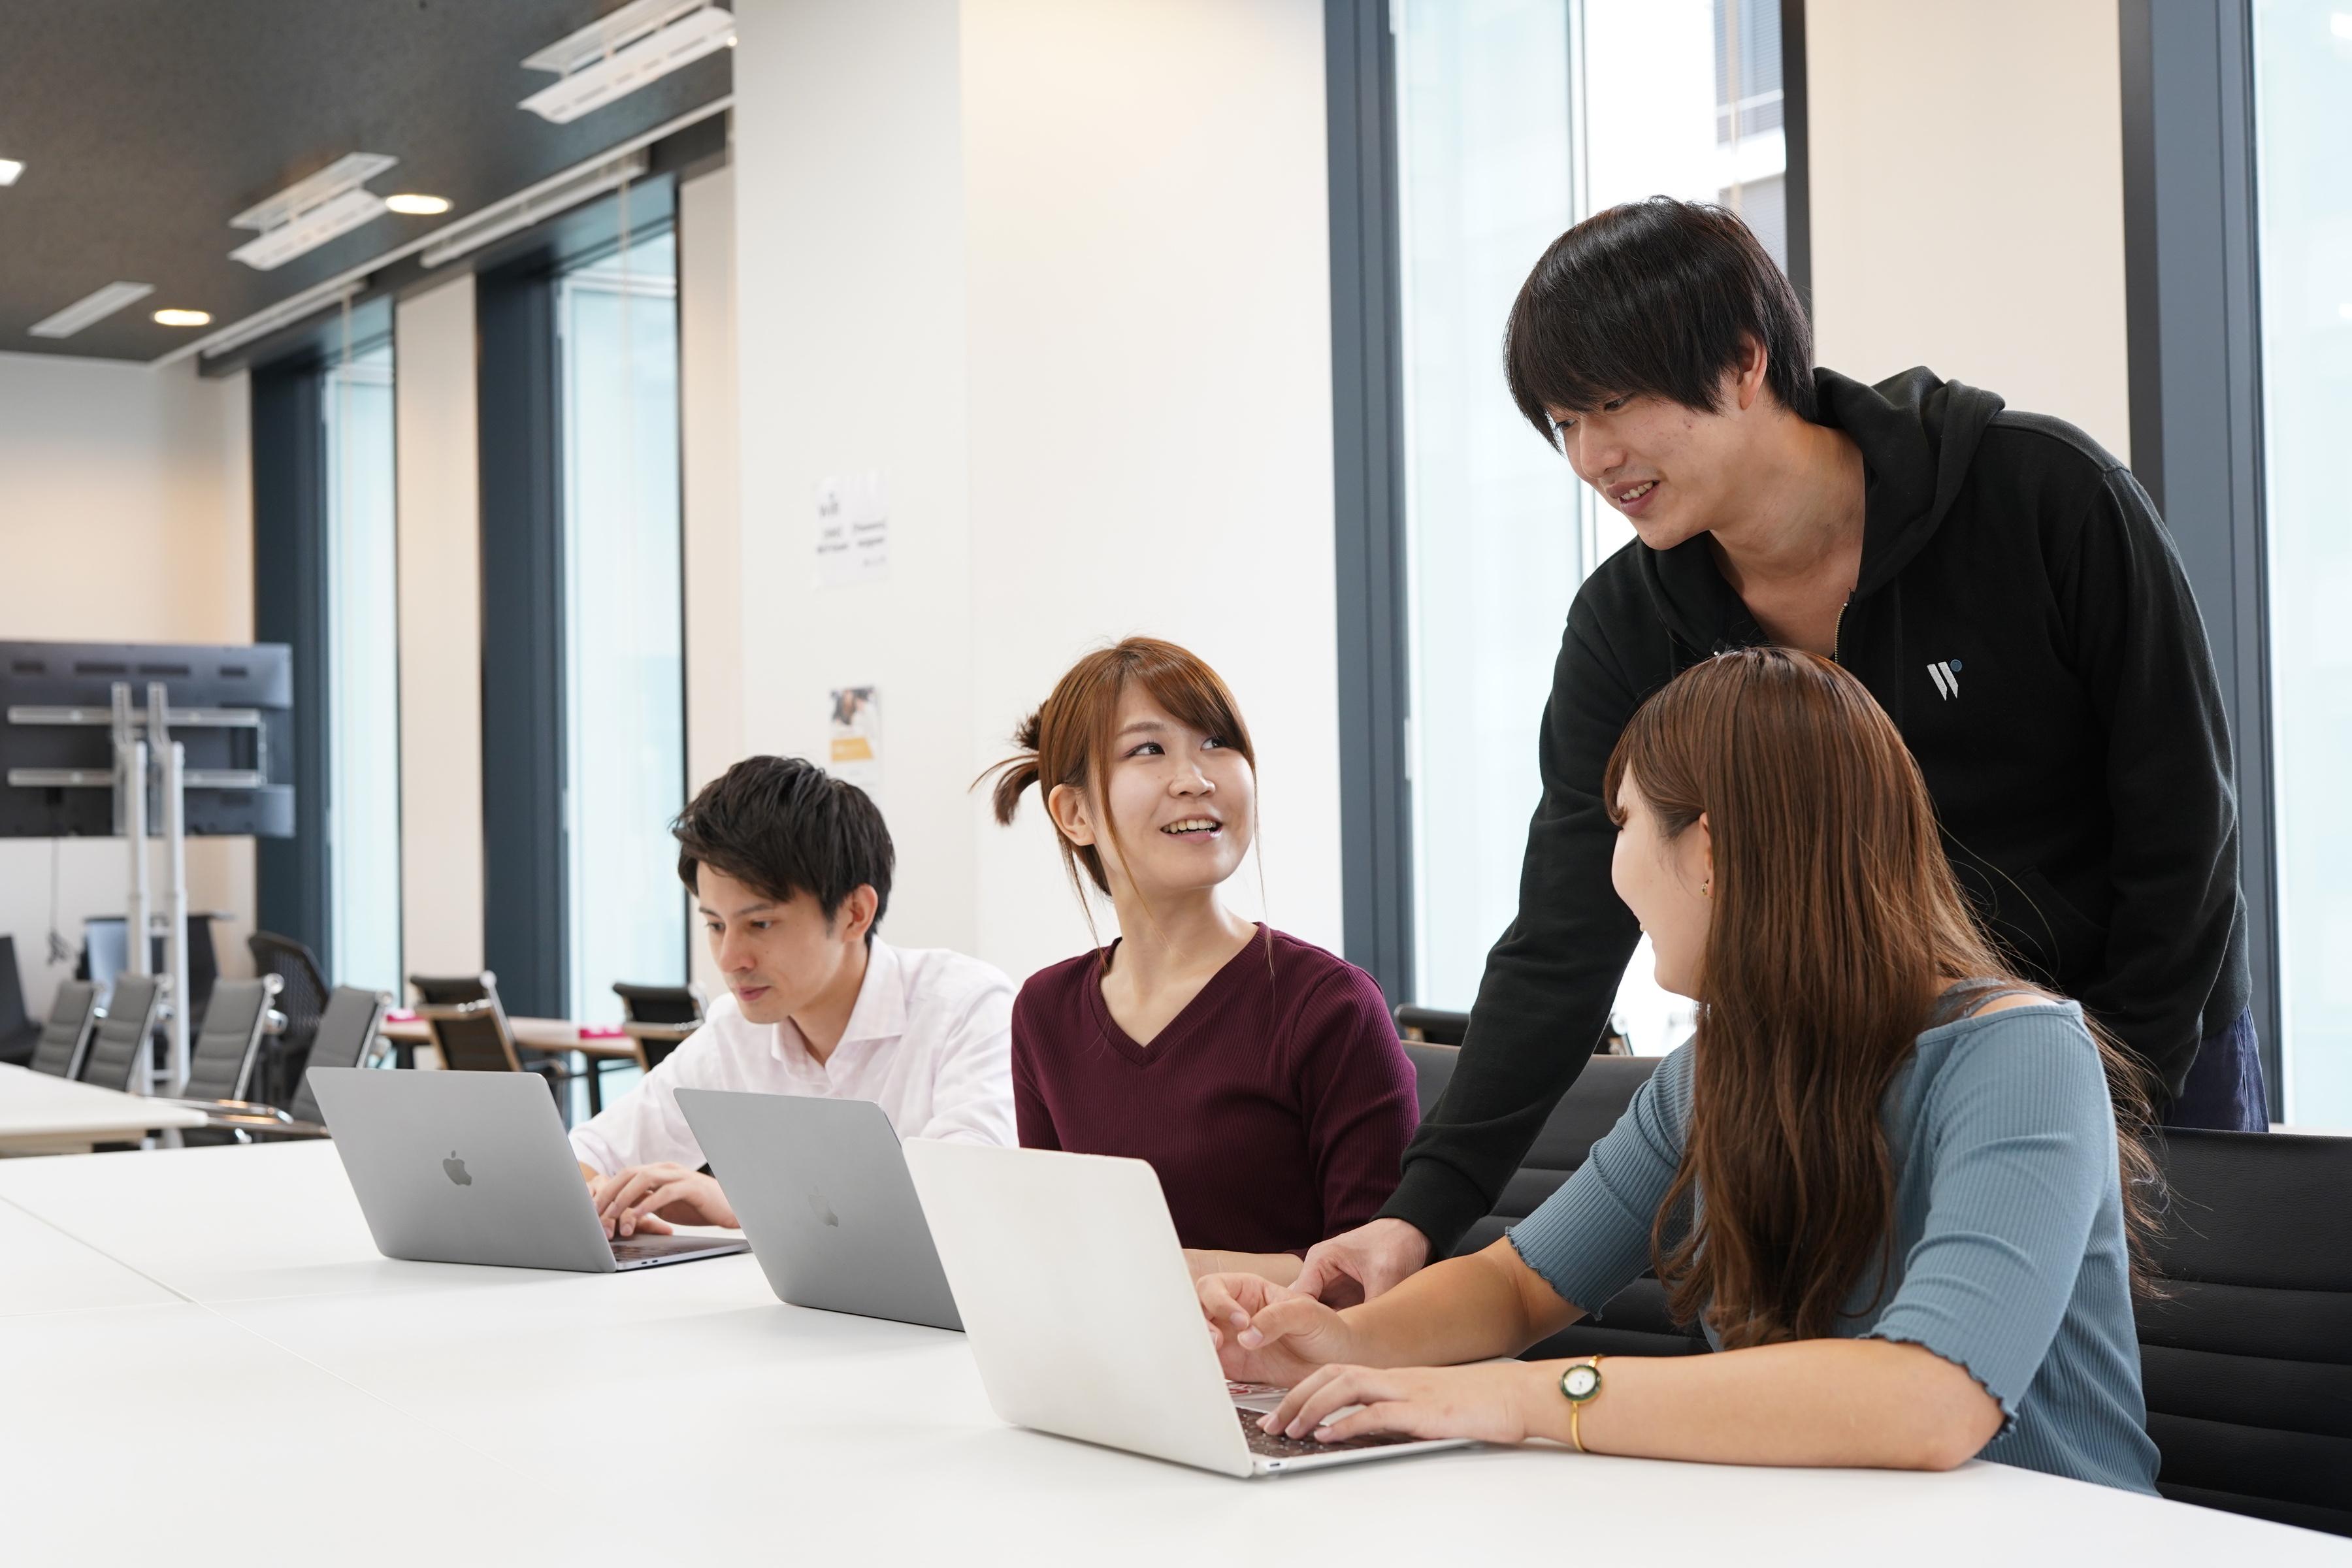 ITエンジニアを育てる「DMM WEBCAMP」!プログラミングスクールにおけるメンターをできるフリーランスエンジニア募集(東京)